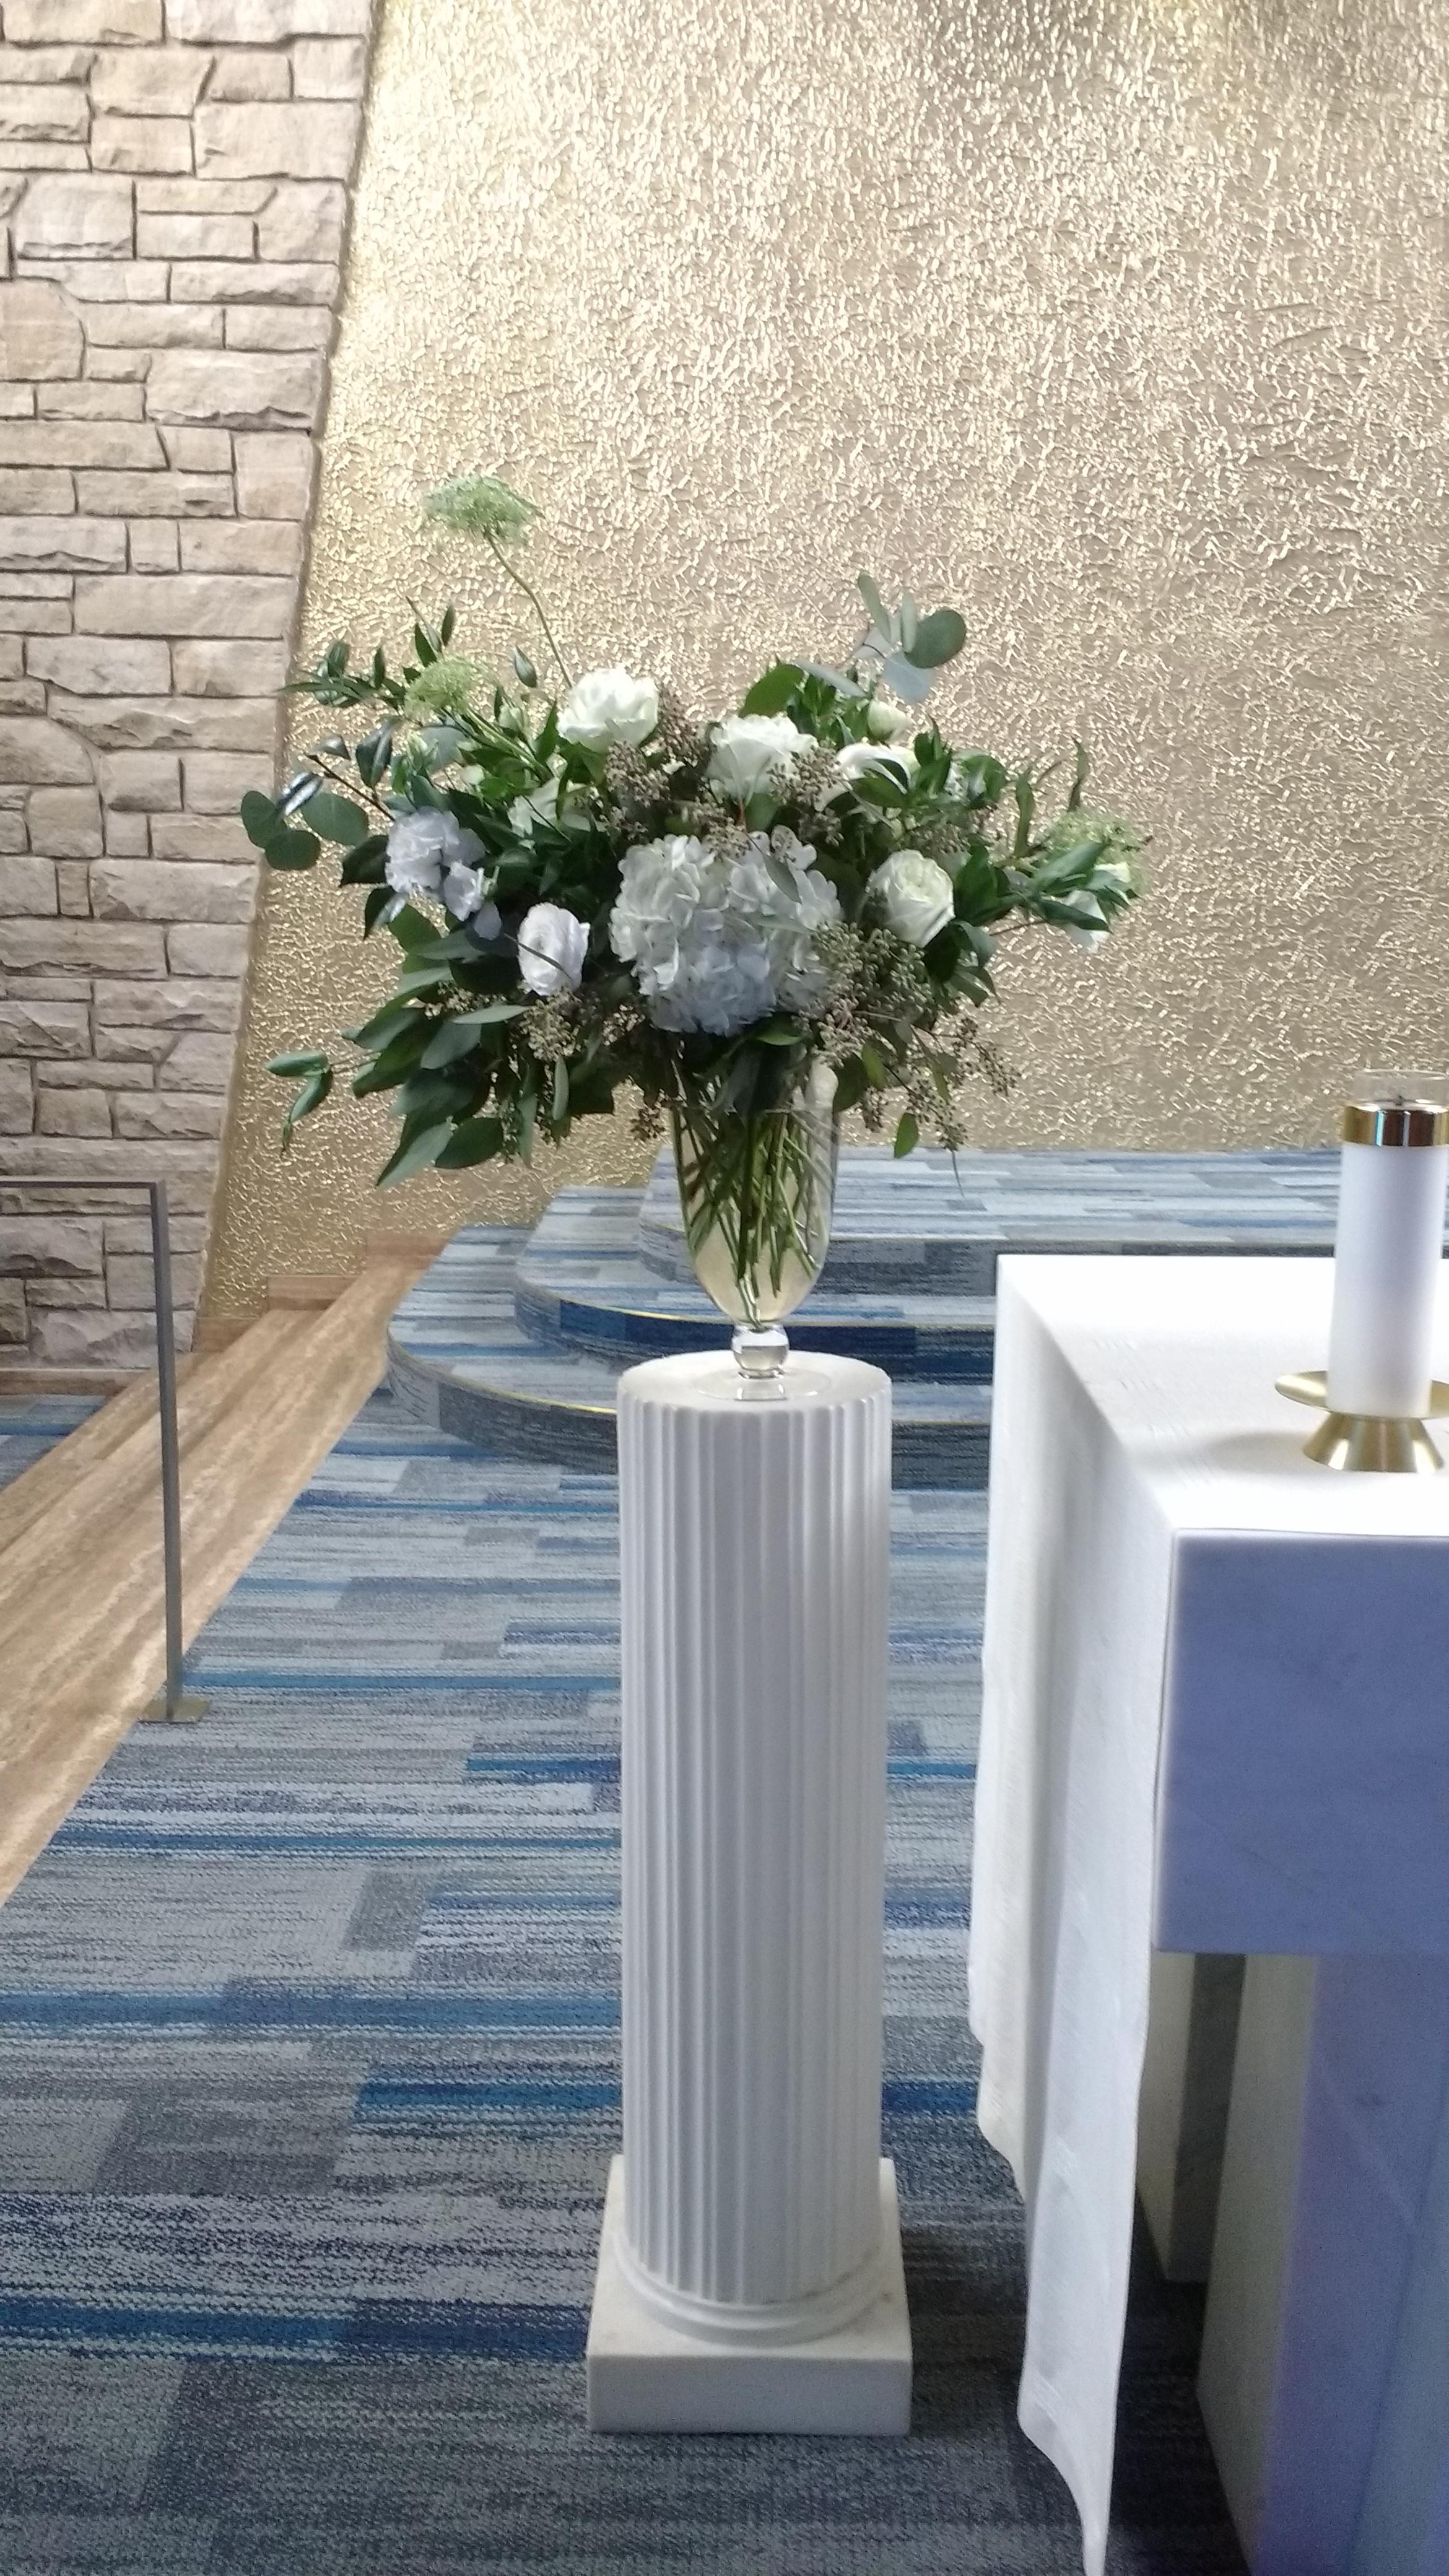 Ceremony space arrangement